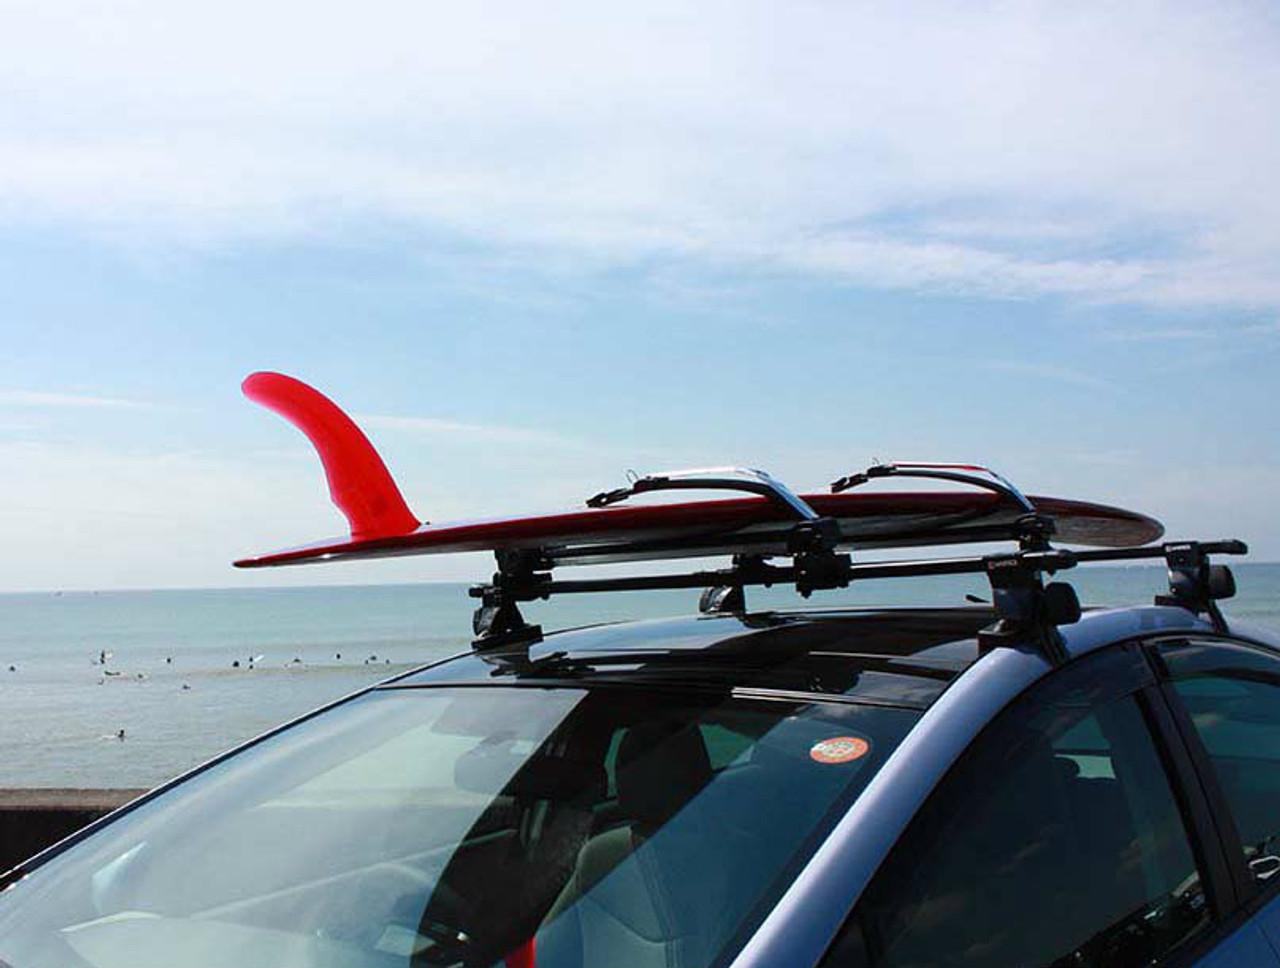 Surfboard Roof Rack >> Locking Surfboard Roof Rack System Inno Boardlocker